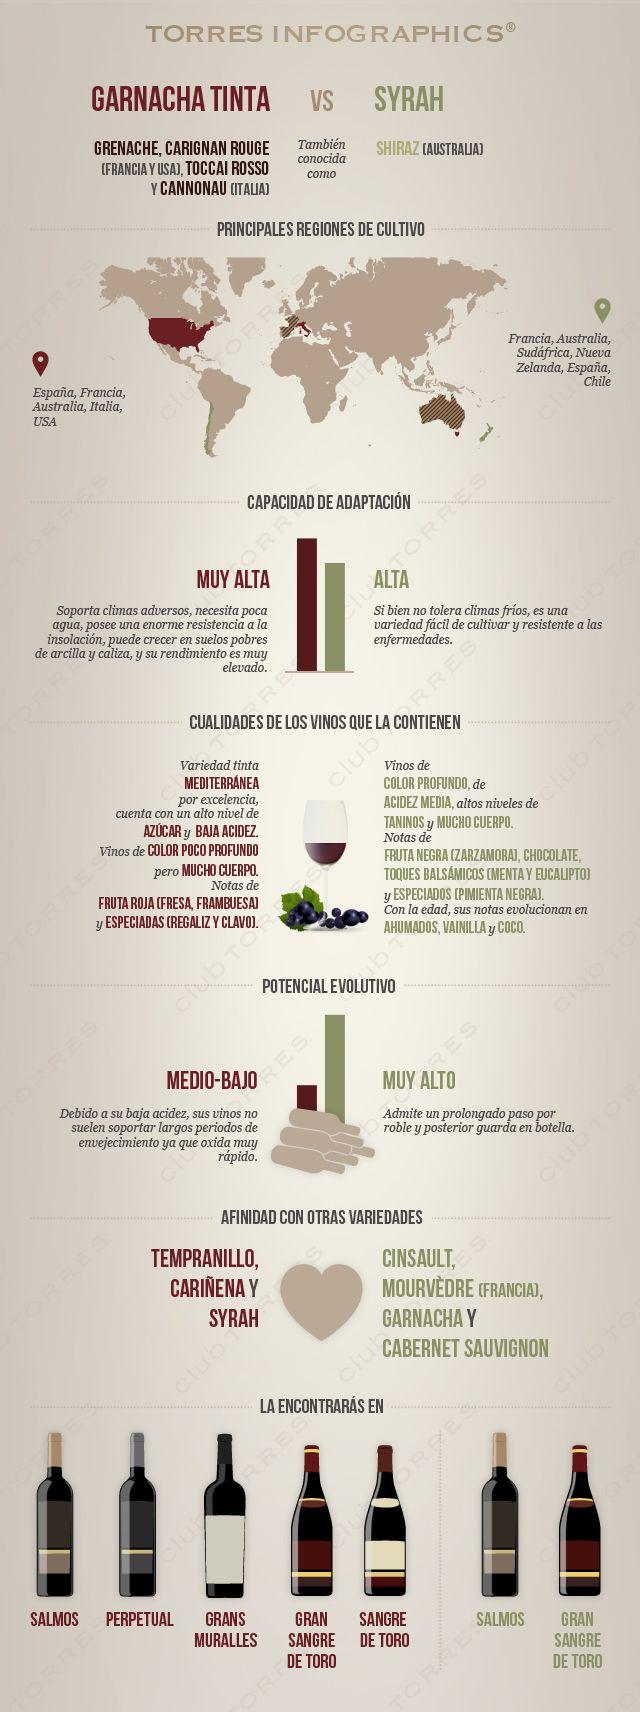 #Infografía: Garnacha tinta Vs Syrah. #Vino